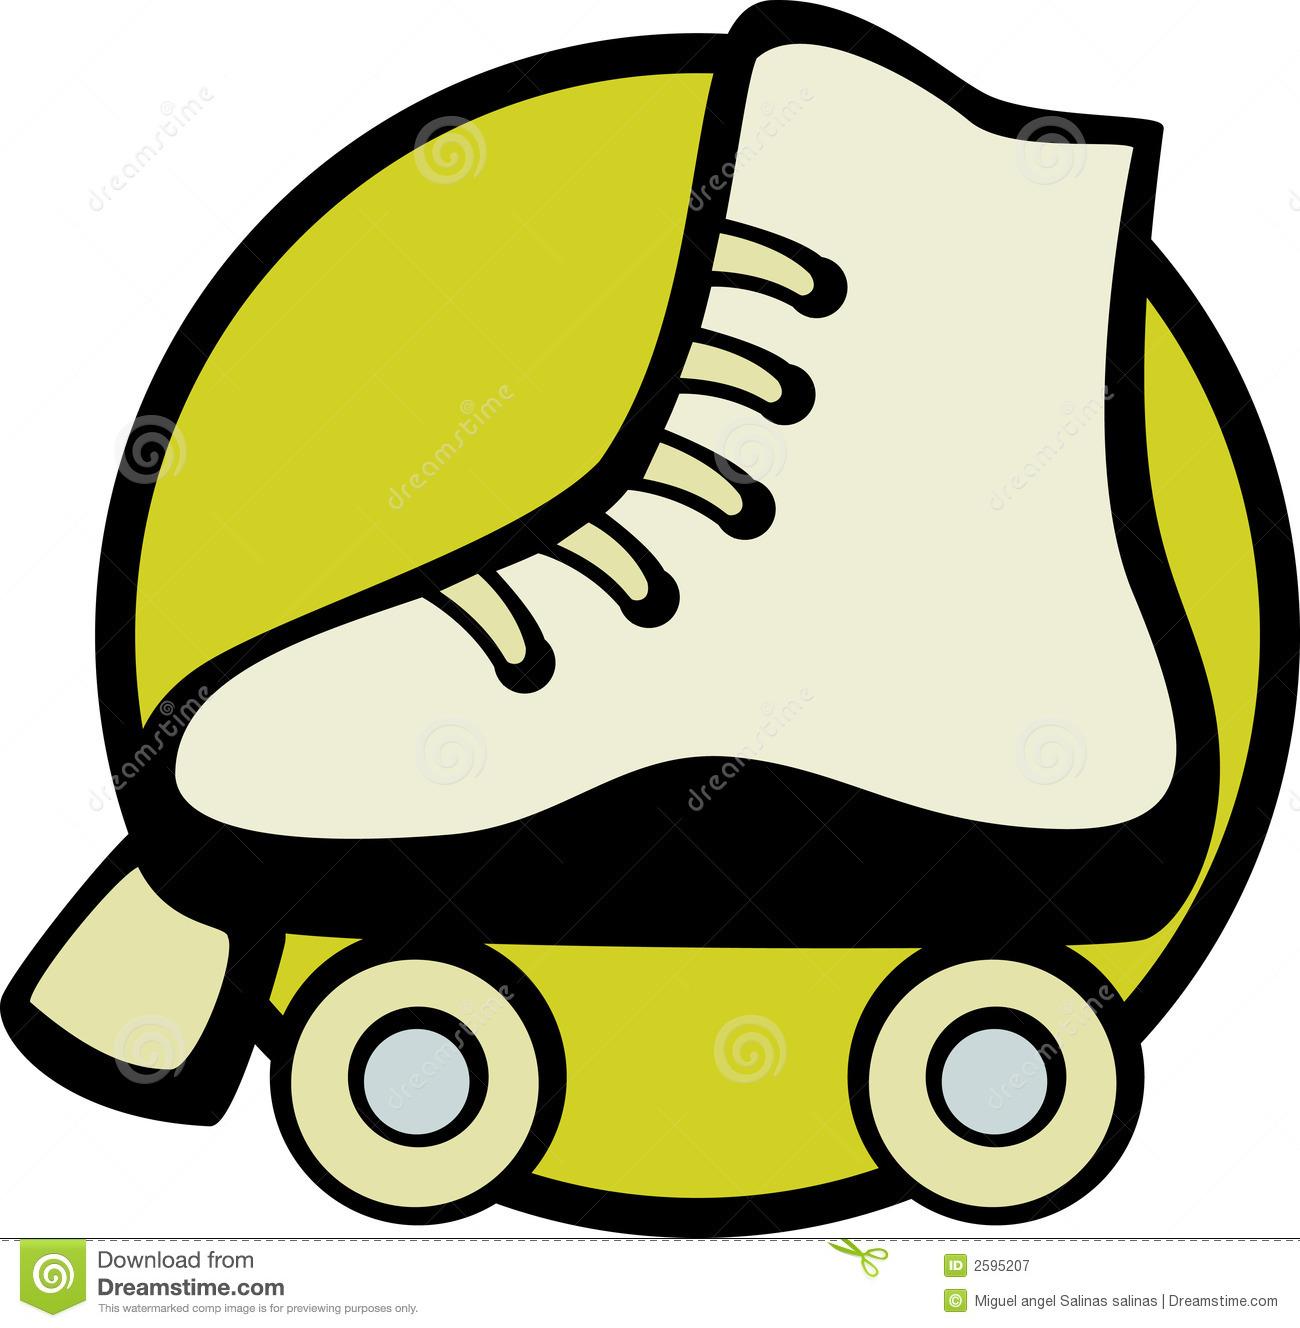 80s Roller Skating Clipart . Roller skate vector illustration Royalty Free Stock Photography